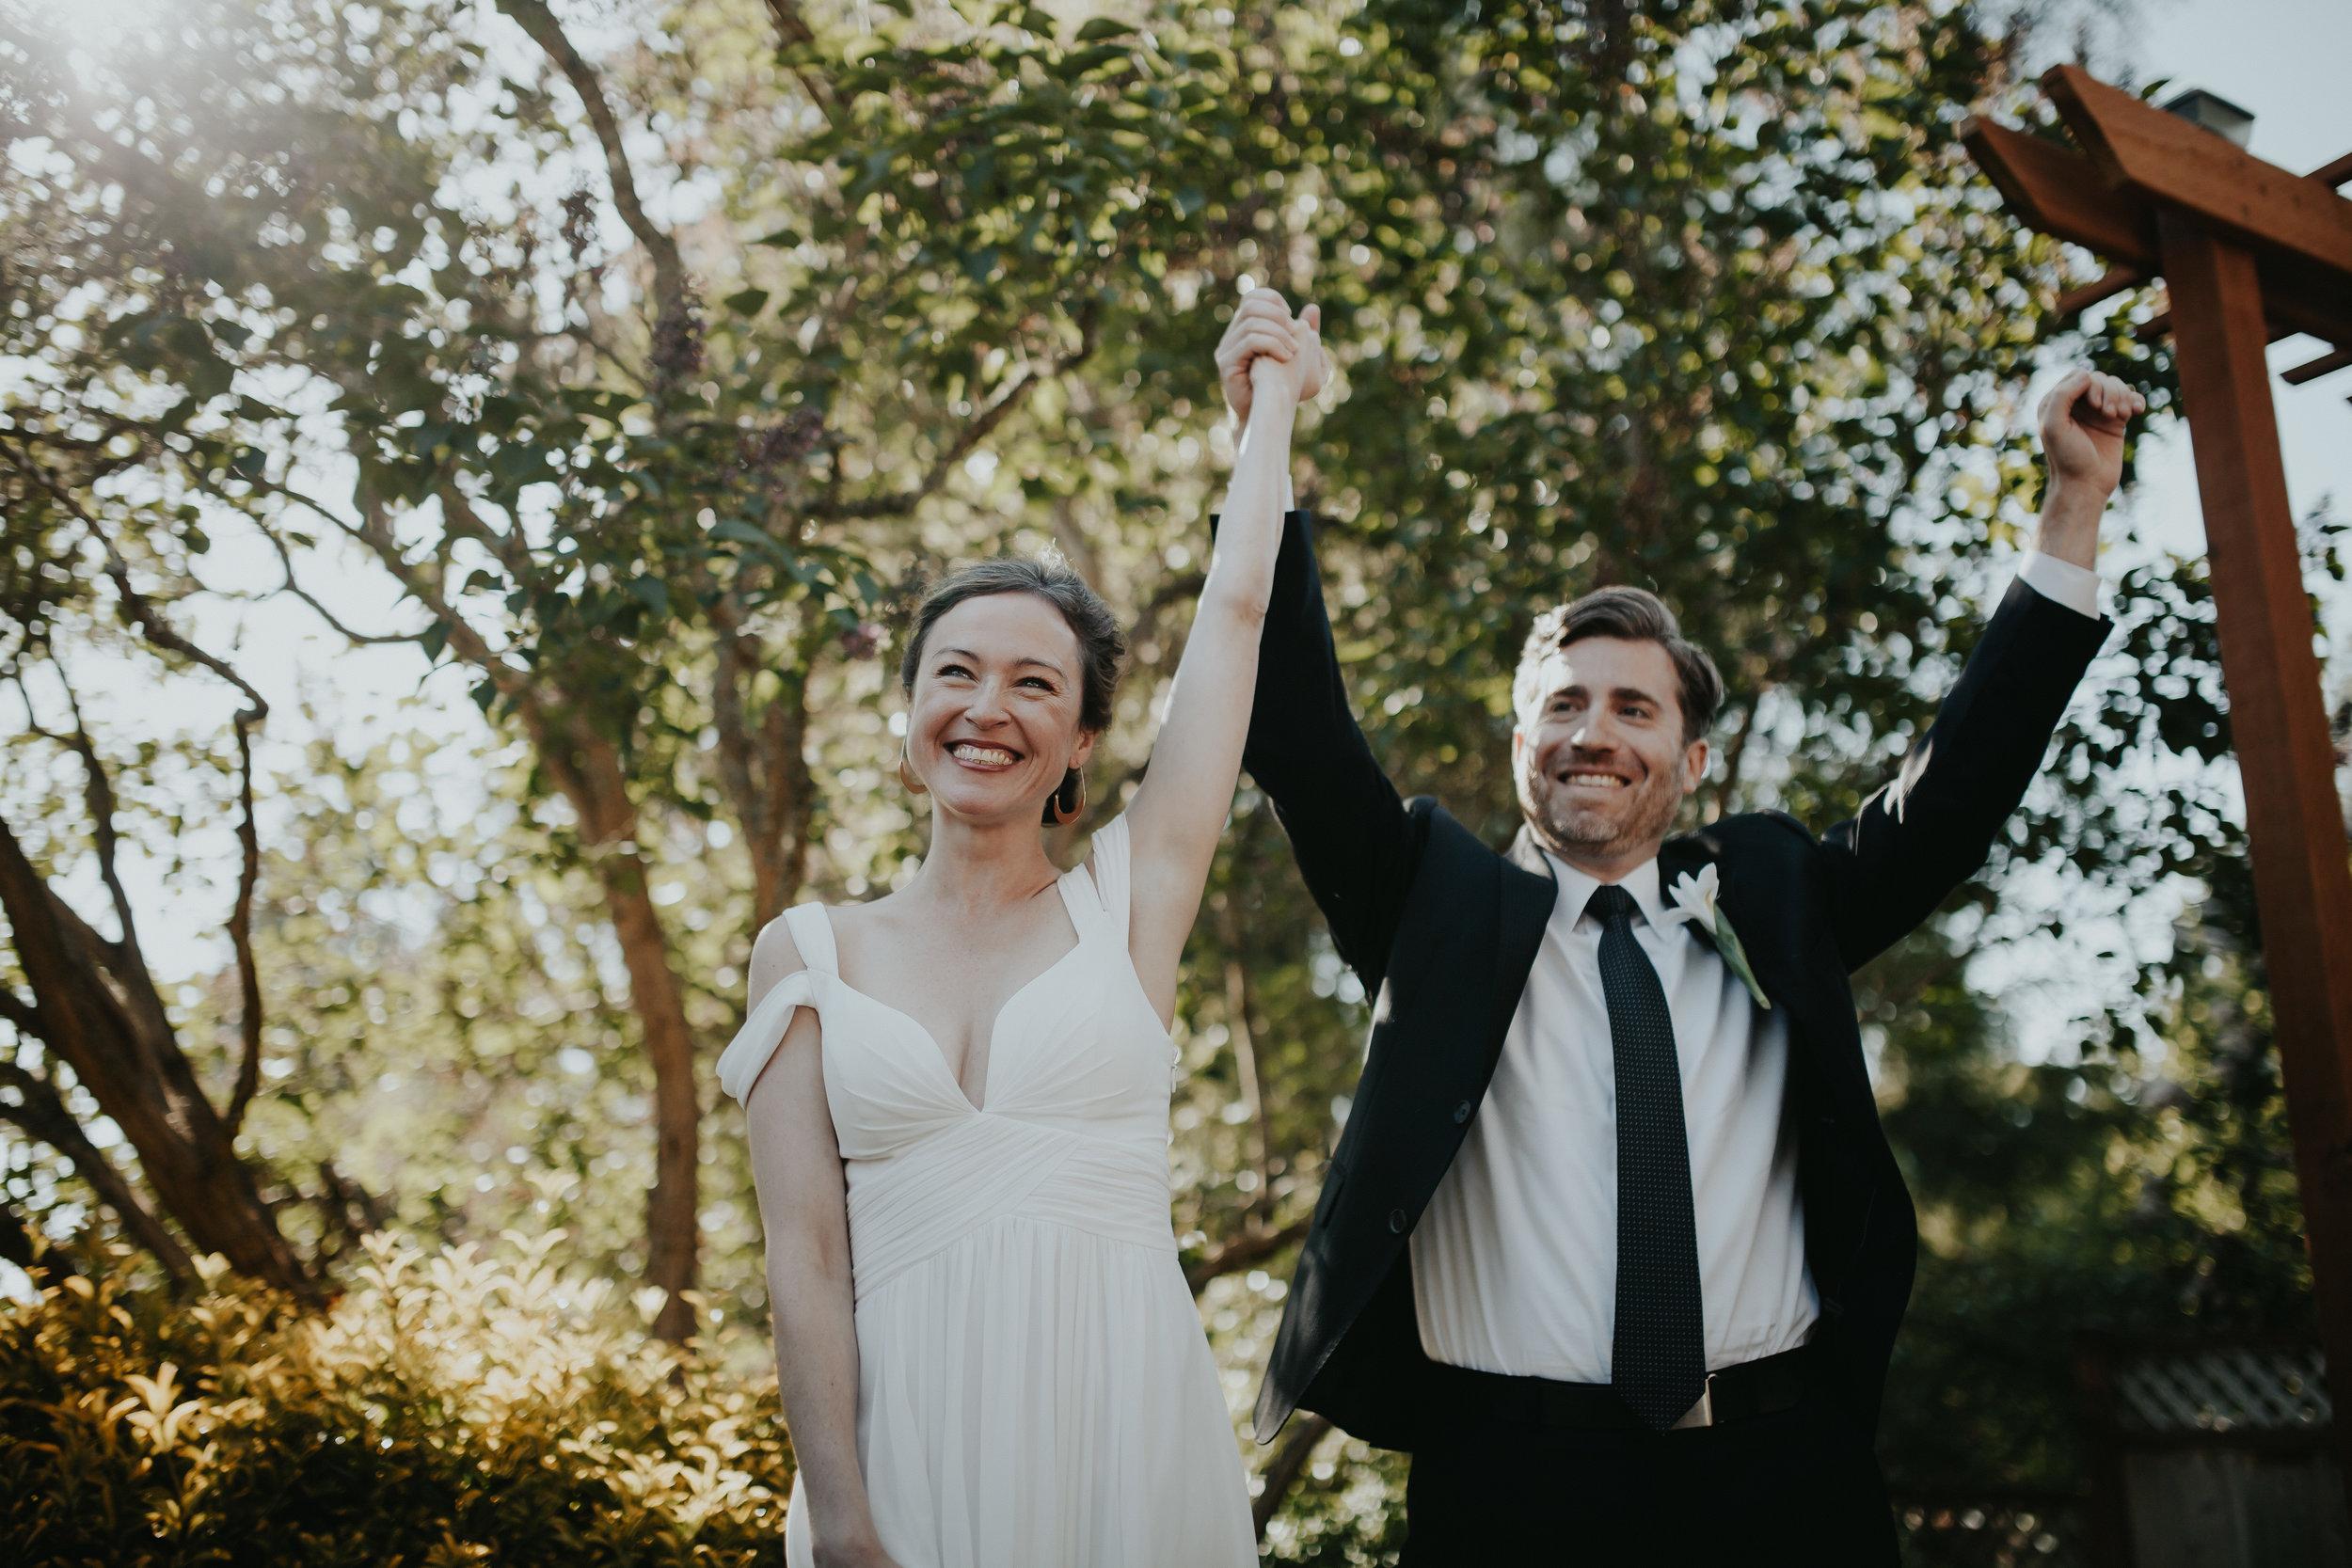 backyard summer wedding inspiration | krissie francis photo | seattle summer wedding